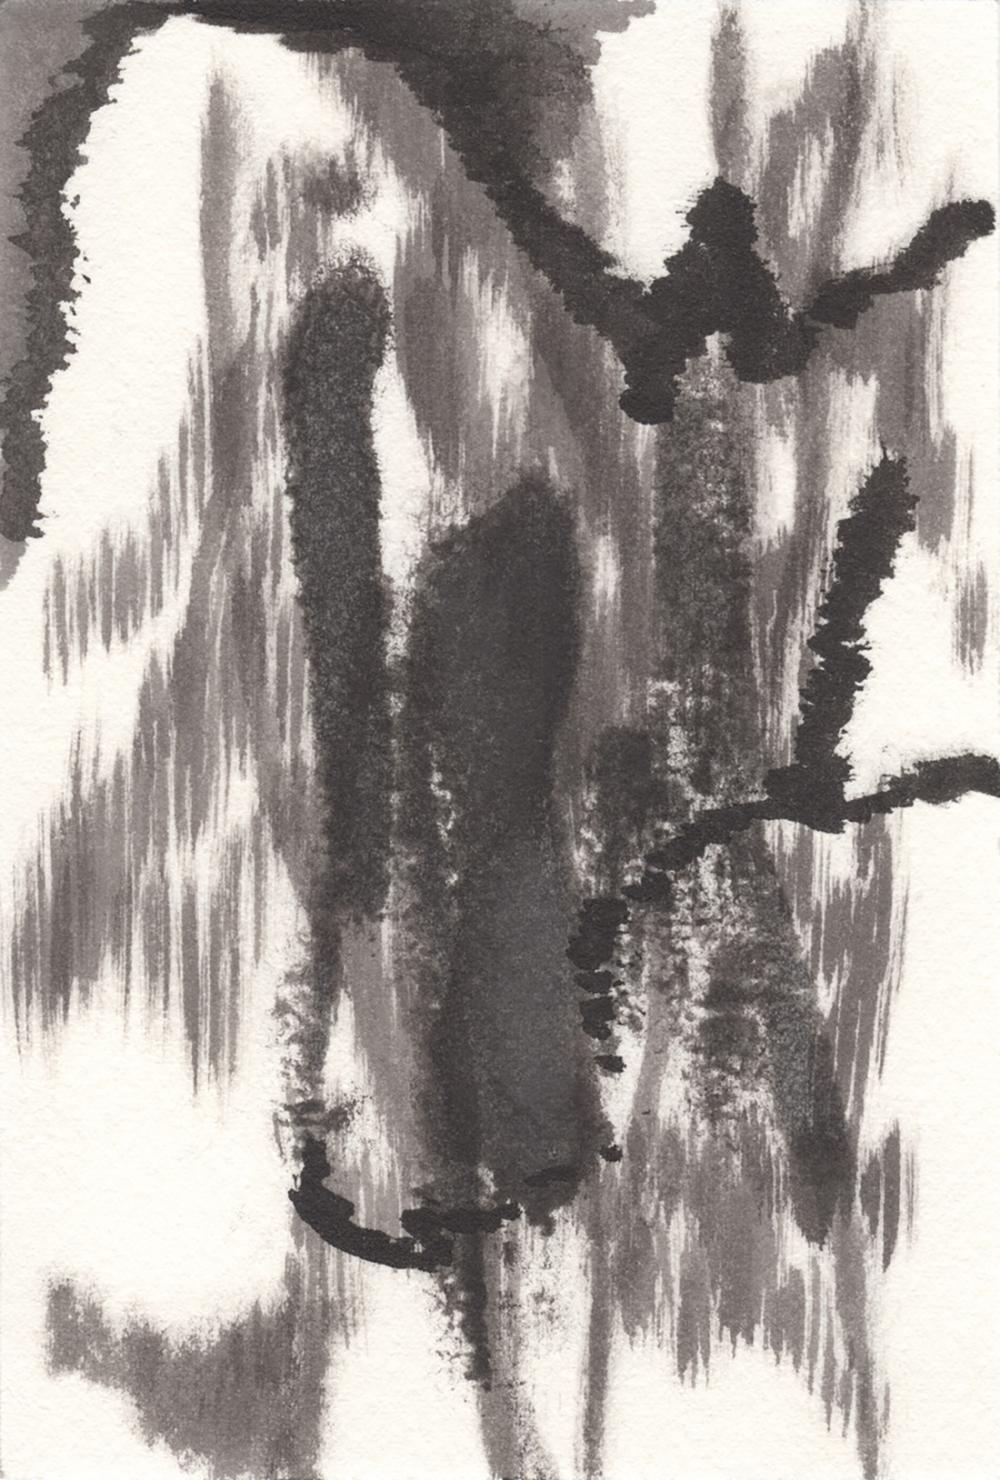 Julie Mehretu (America 1970-) Untitled, 2021